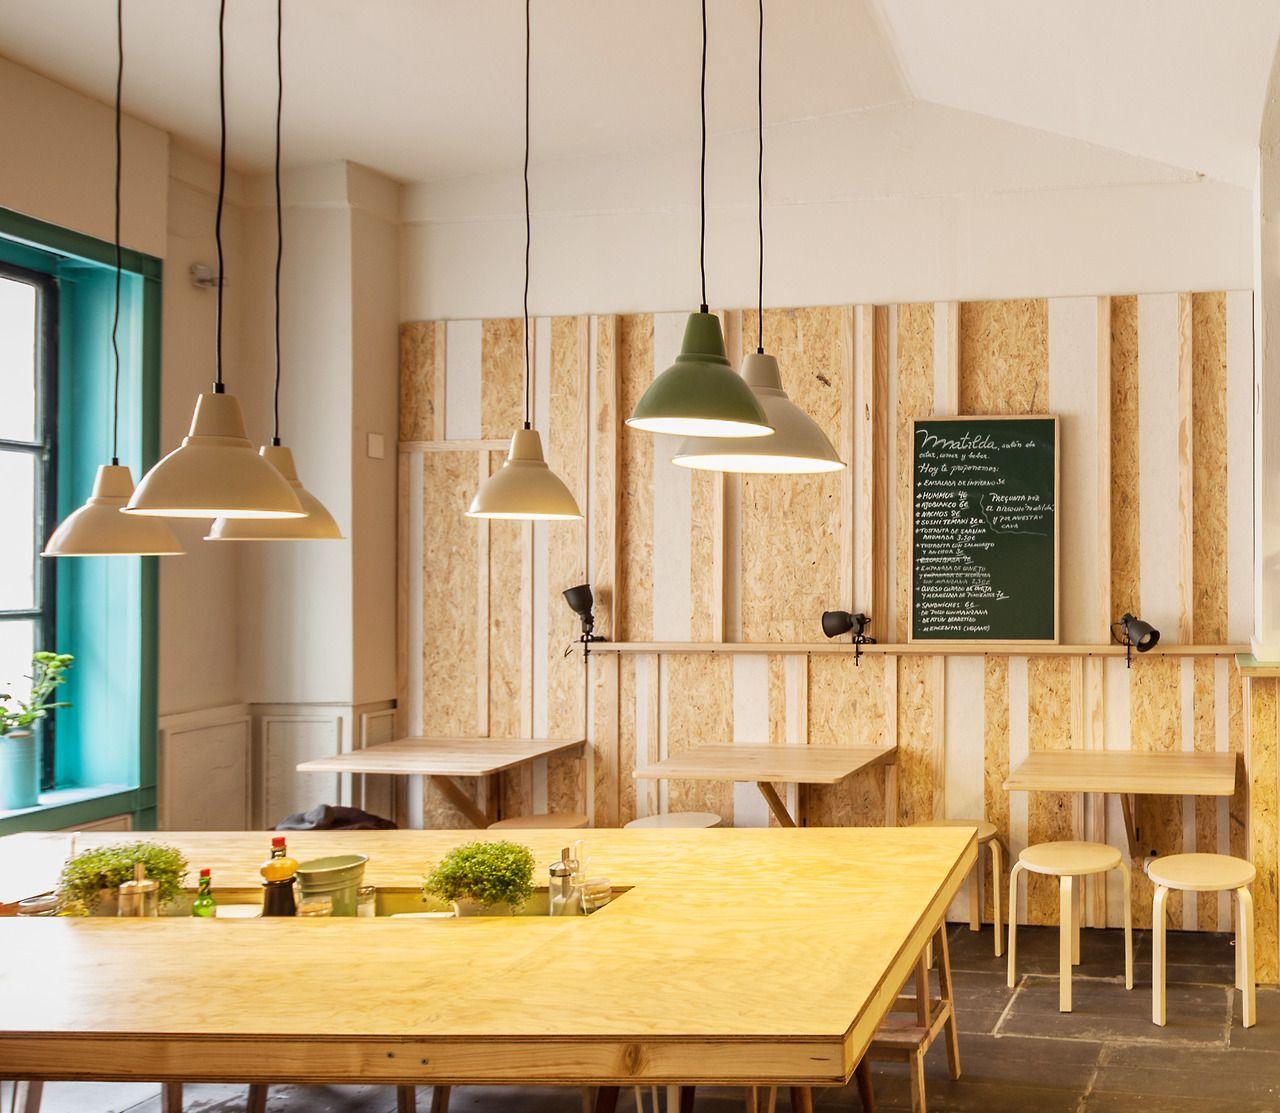 Takeovertime Restaurant Interior Design Bar Design Restaurant Cozy Cafe